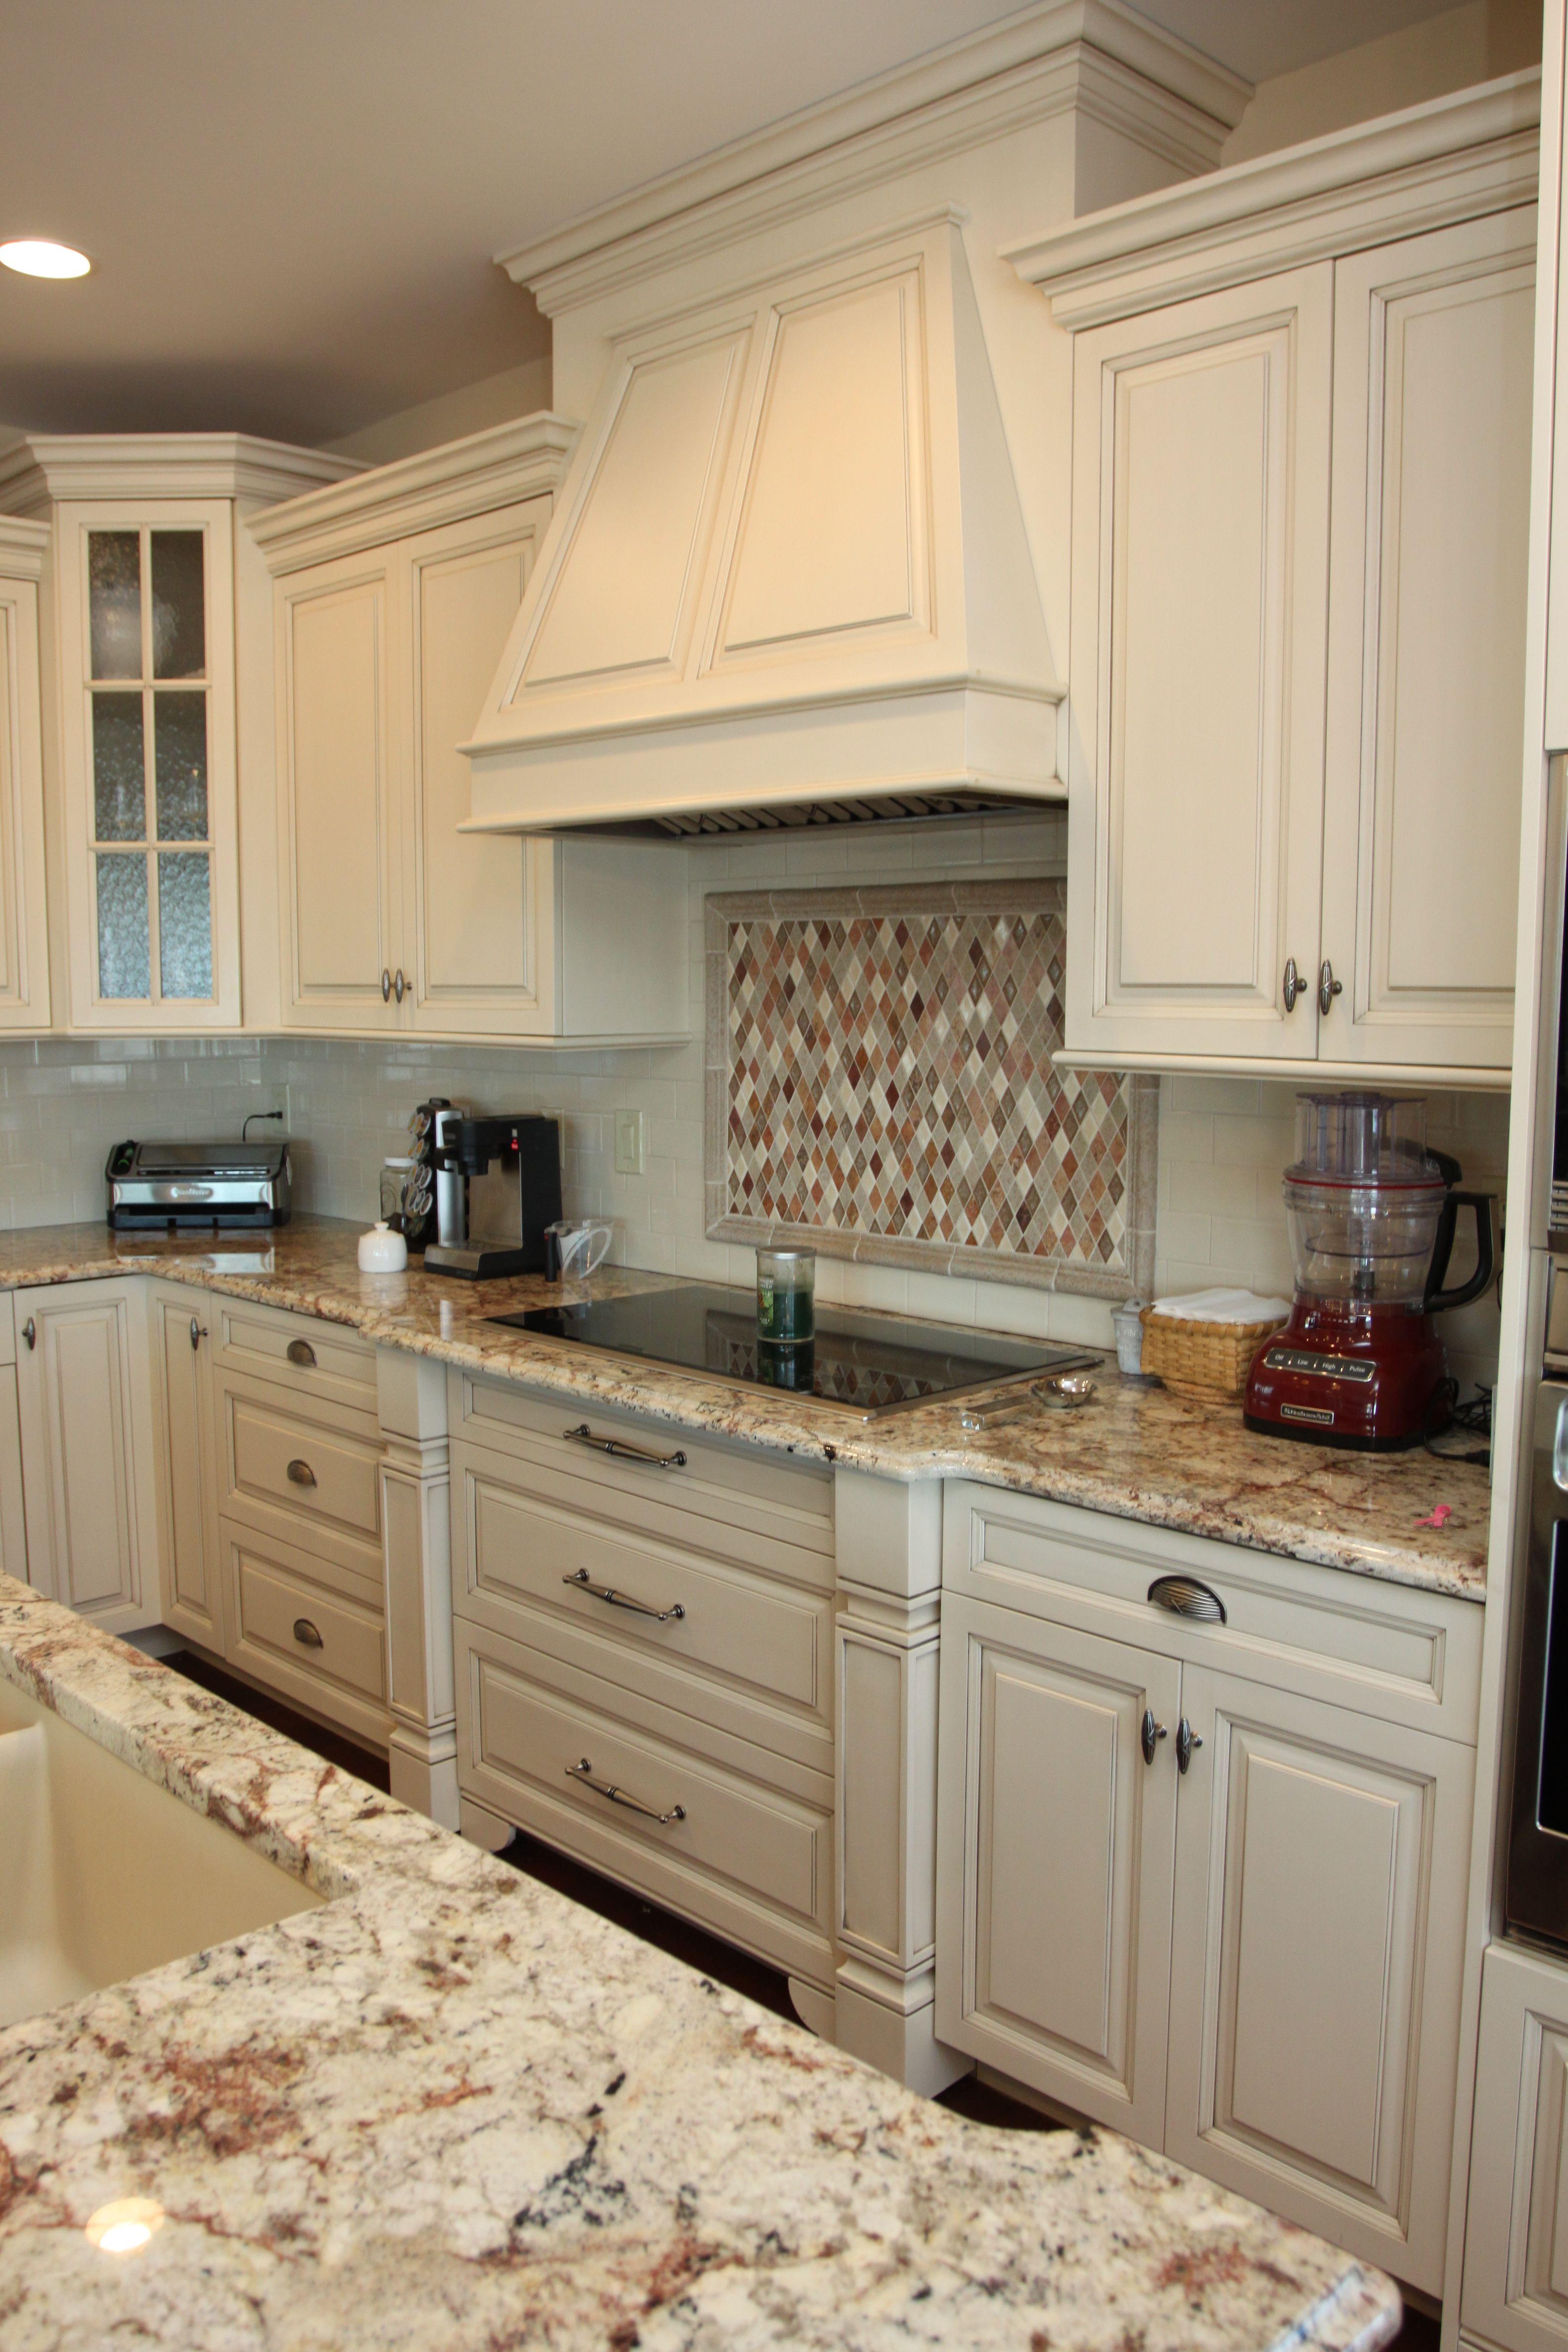 Painted Wood Hood Custom Kitchen Cabinets Custom Built Kitchen Cabinets Kitchen Cabinets